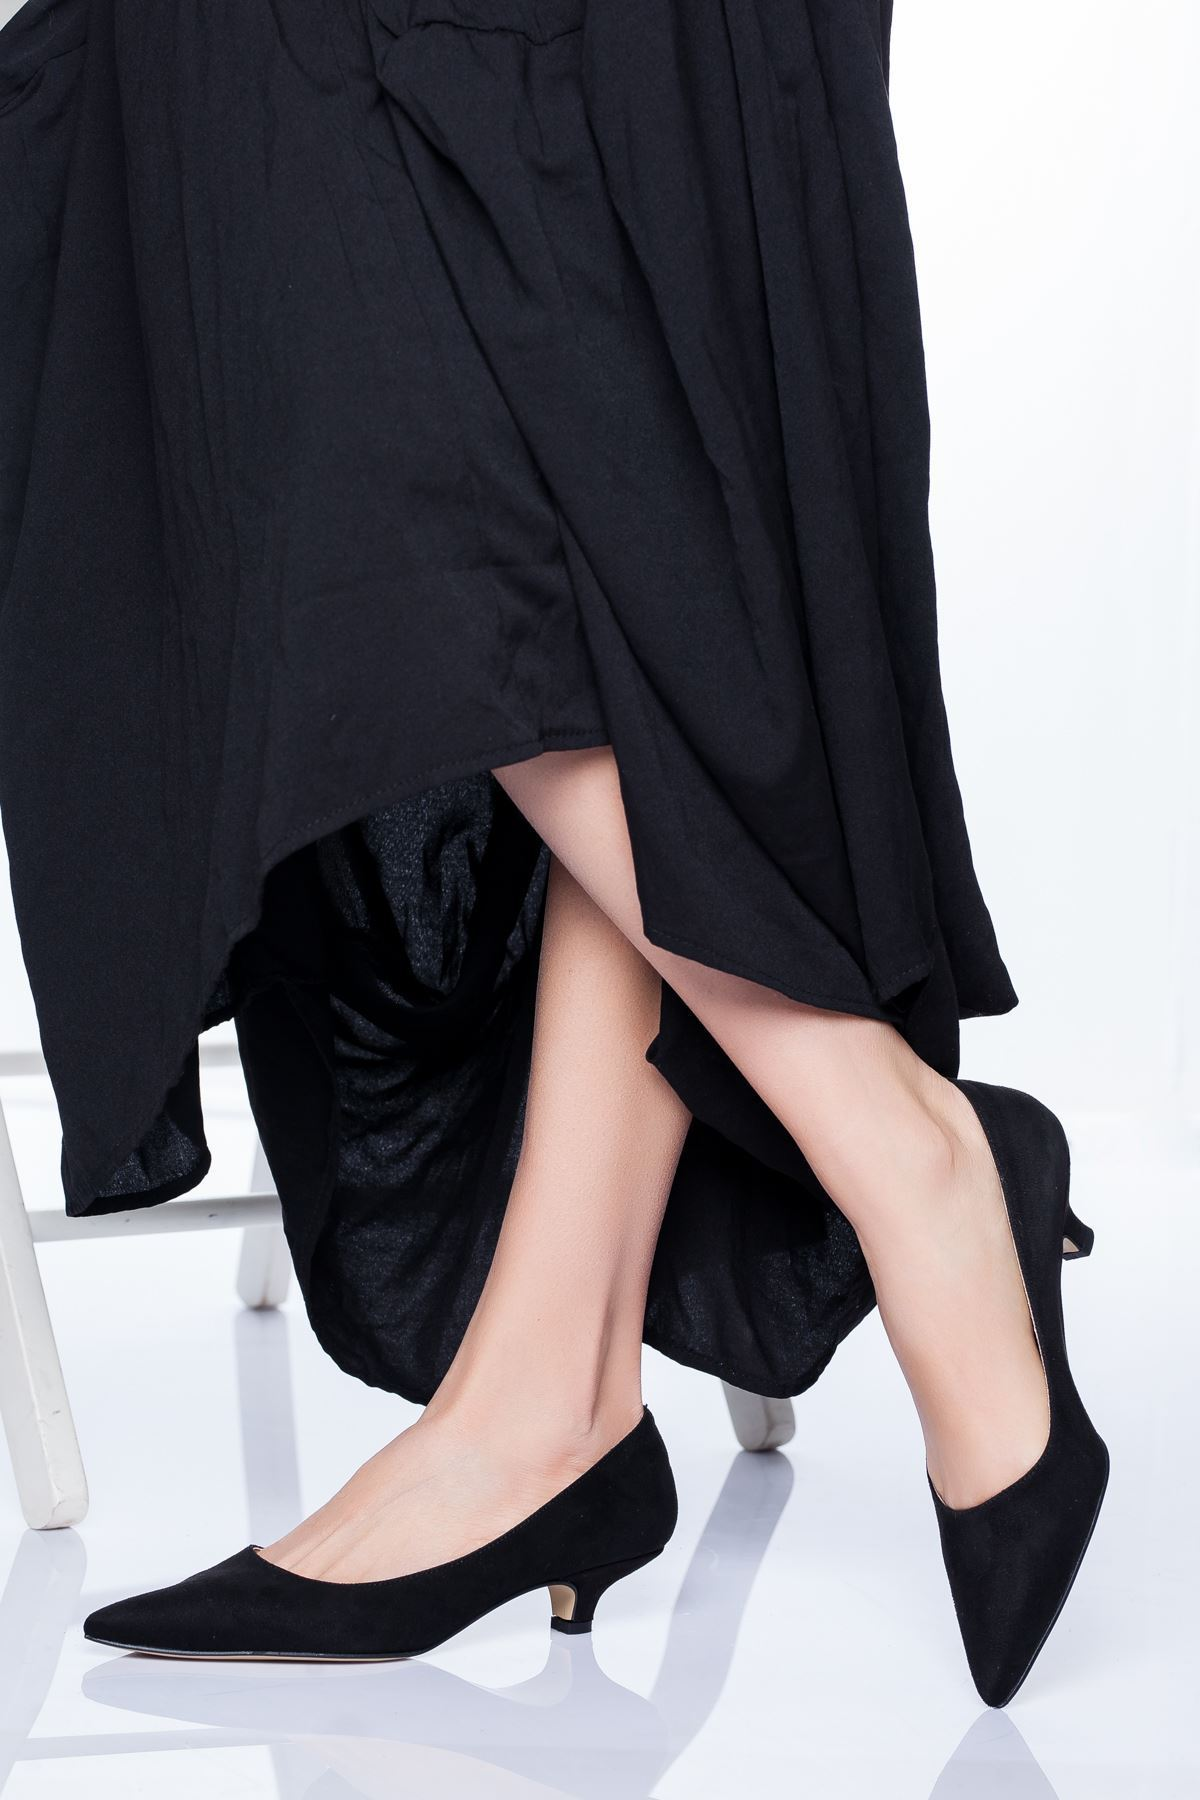 Limsi KısaTopuklu Sivri Burun Ayakkabı Siyah Süet